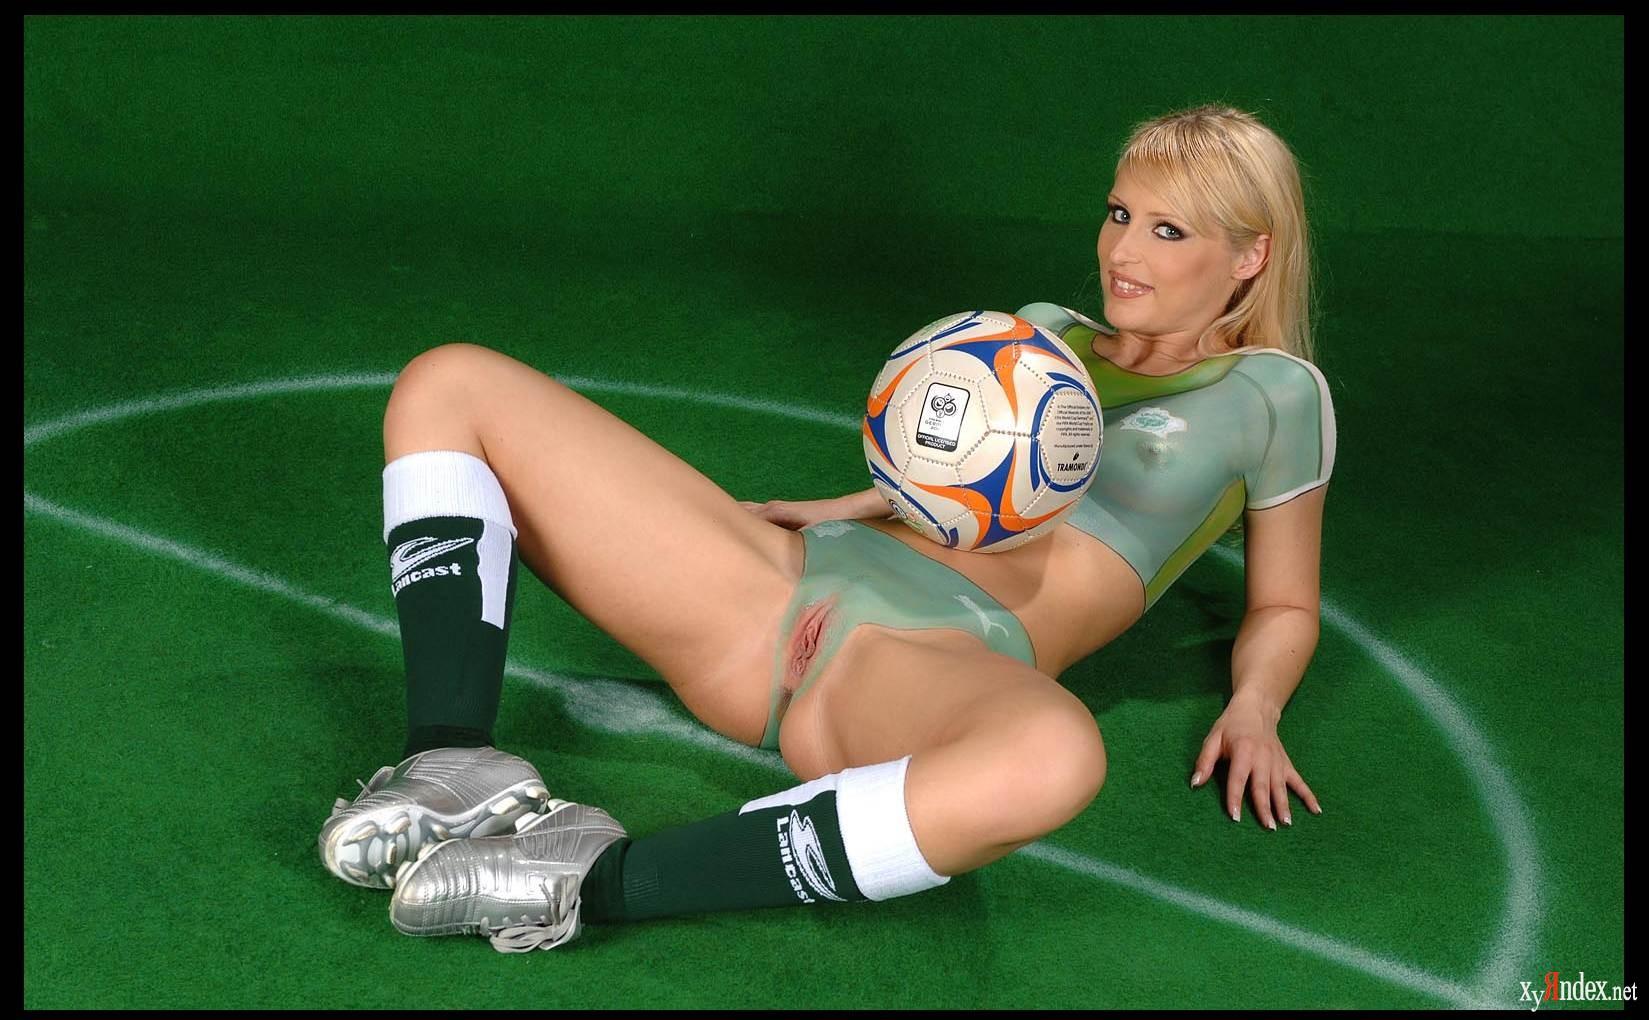 futbol-ero-seks-smotret-porno-foto-domrabotnits